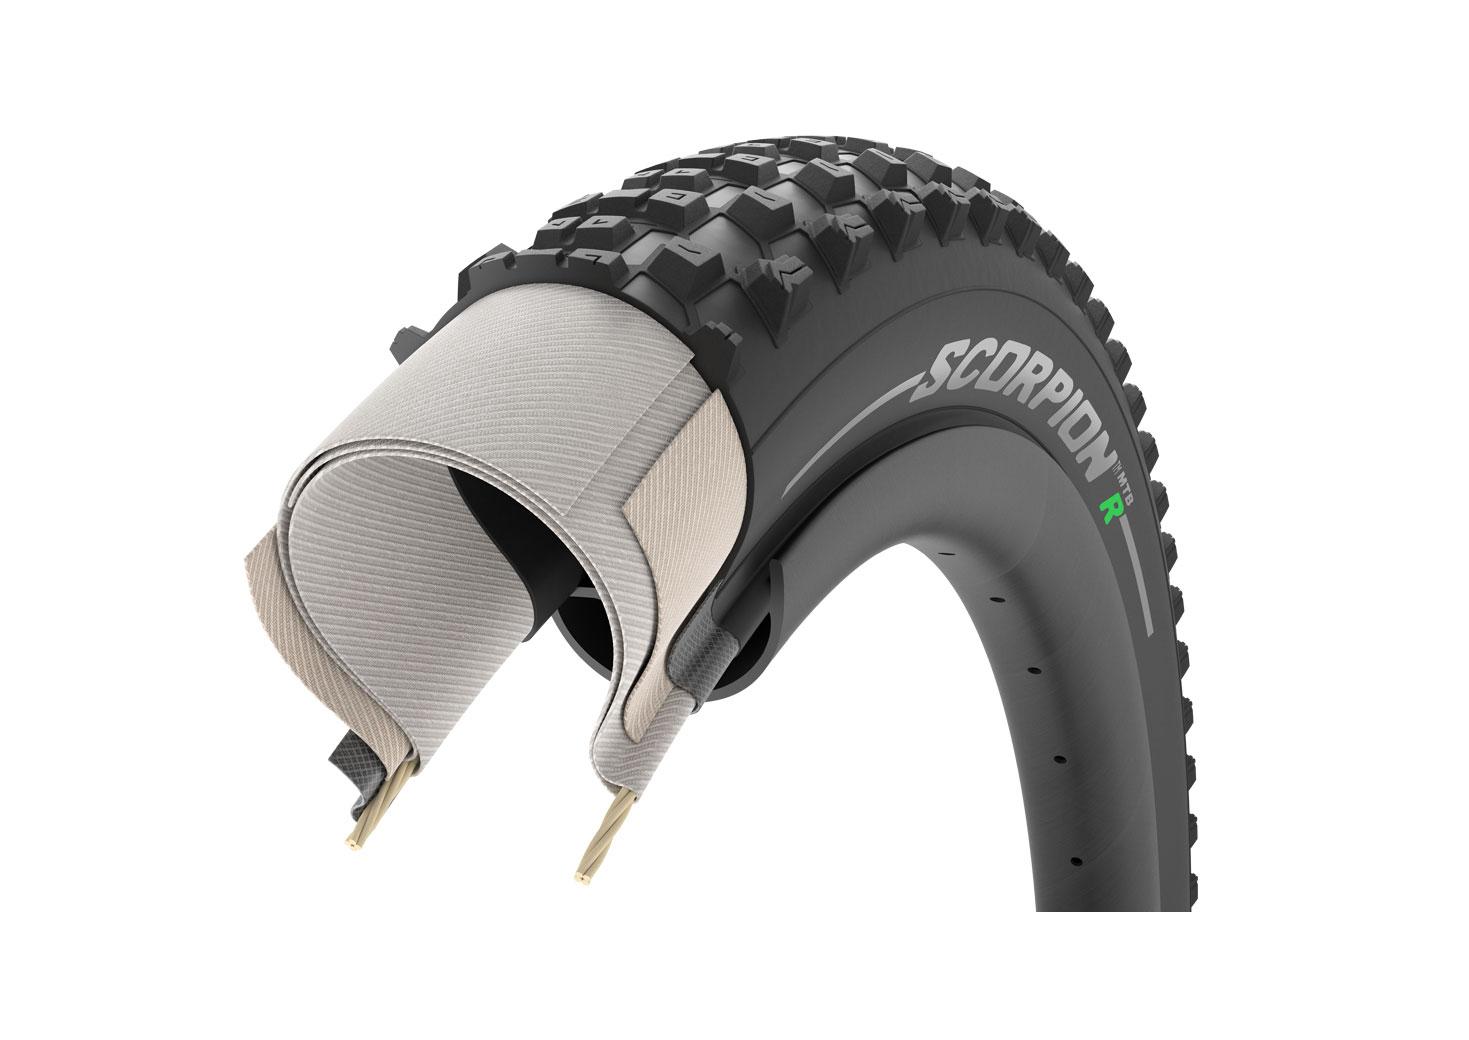 Scorpion™ MTB R